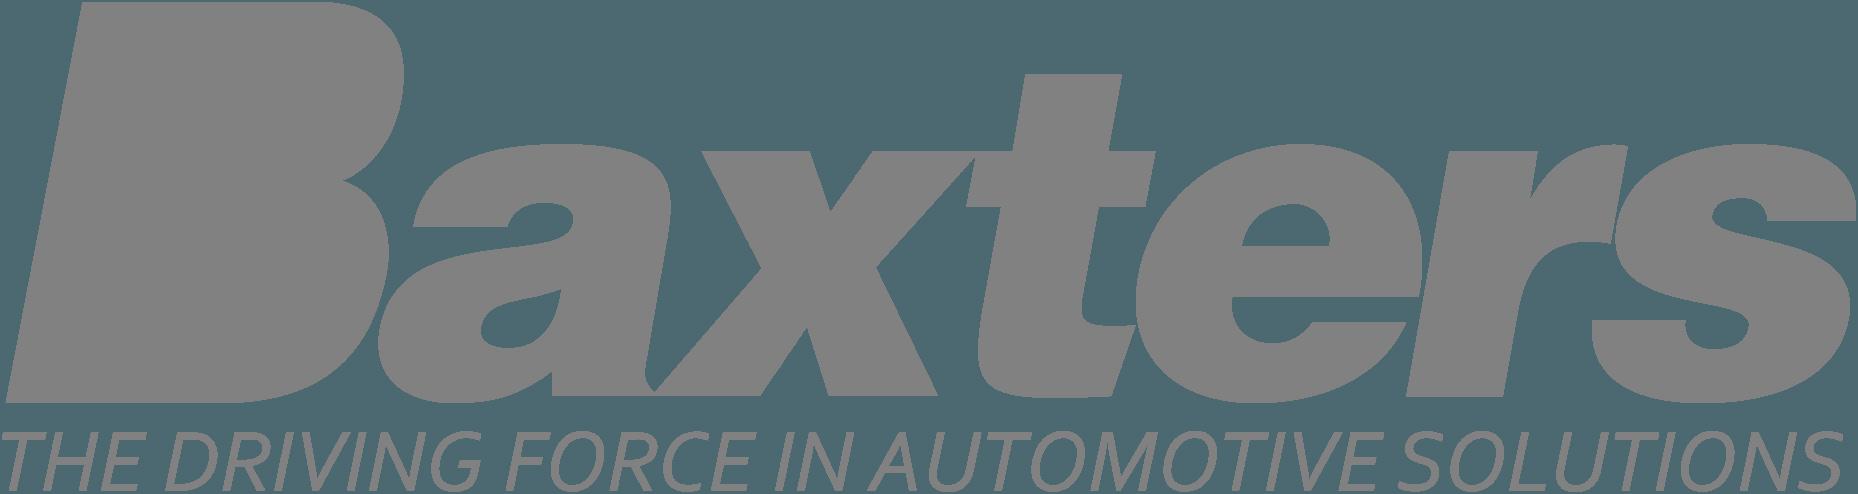 Excavator Parts, GATO Sales and Service